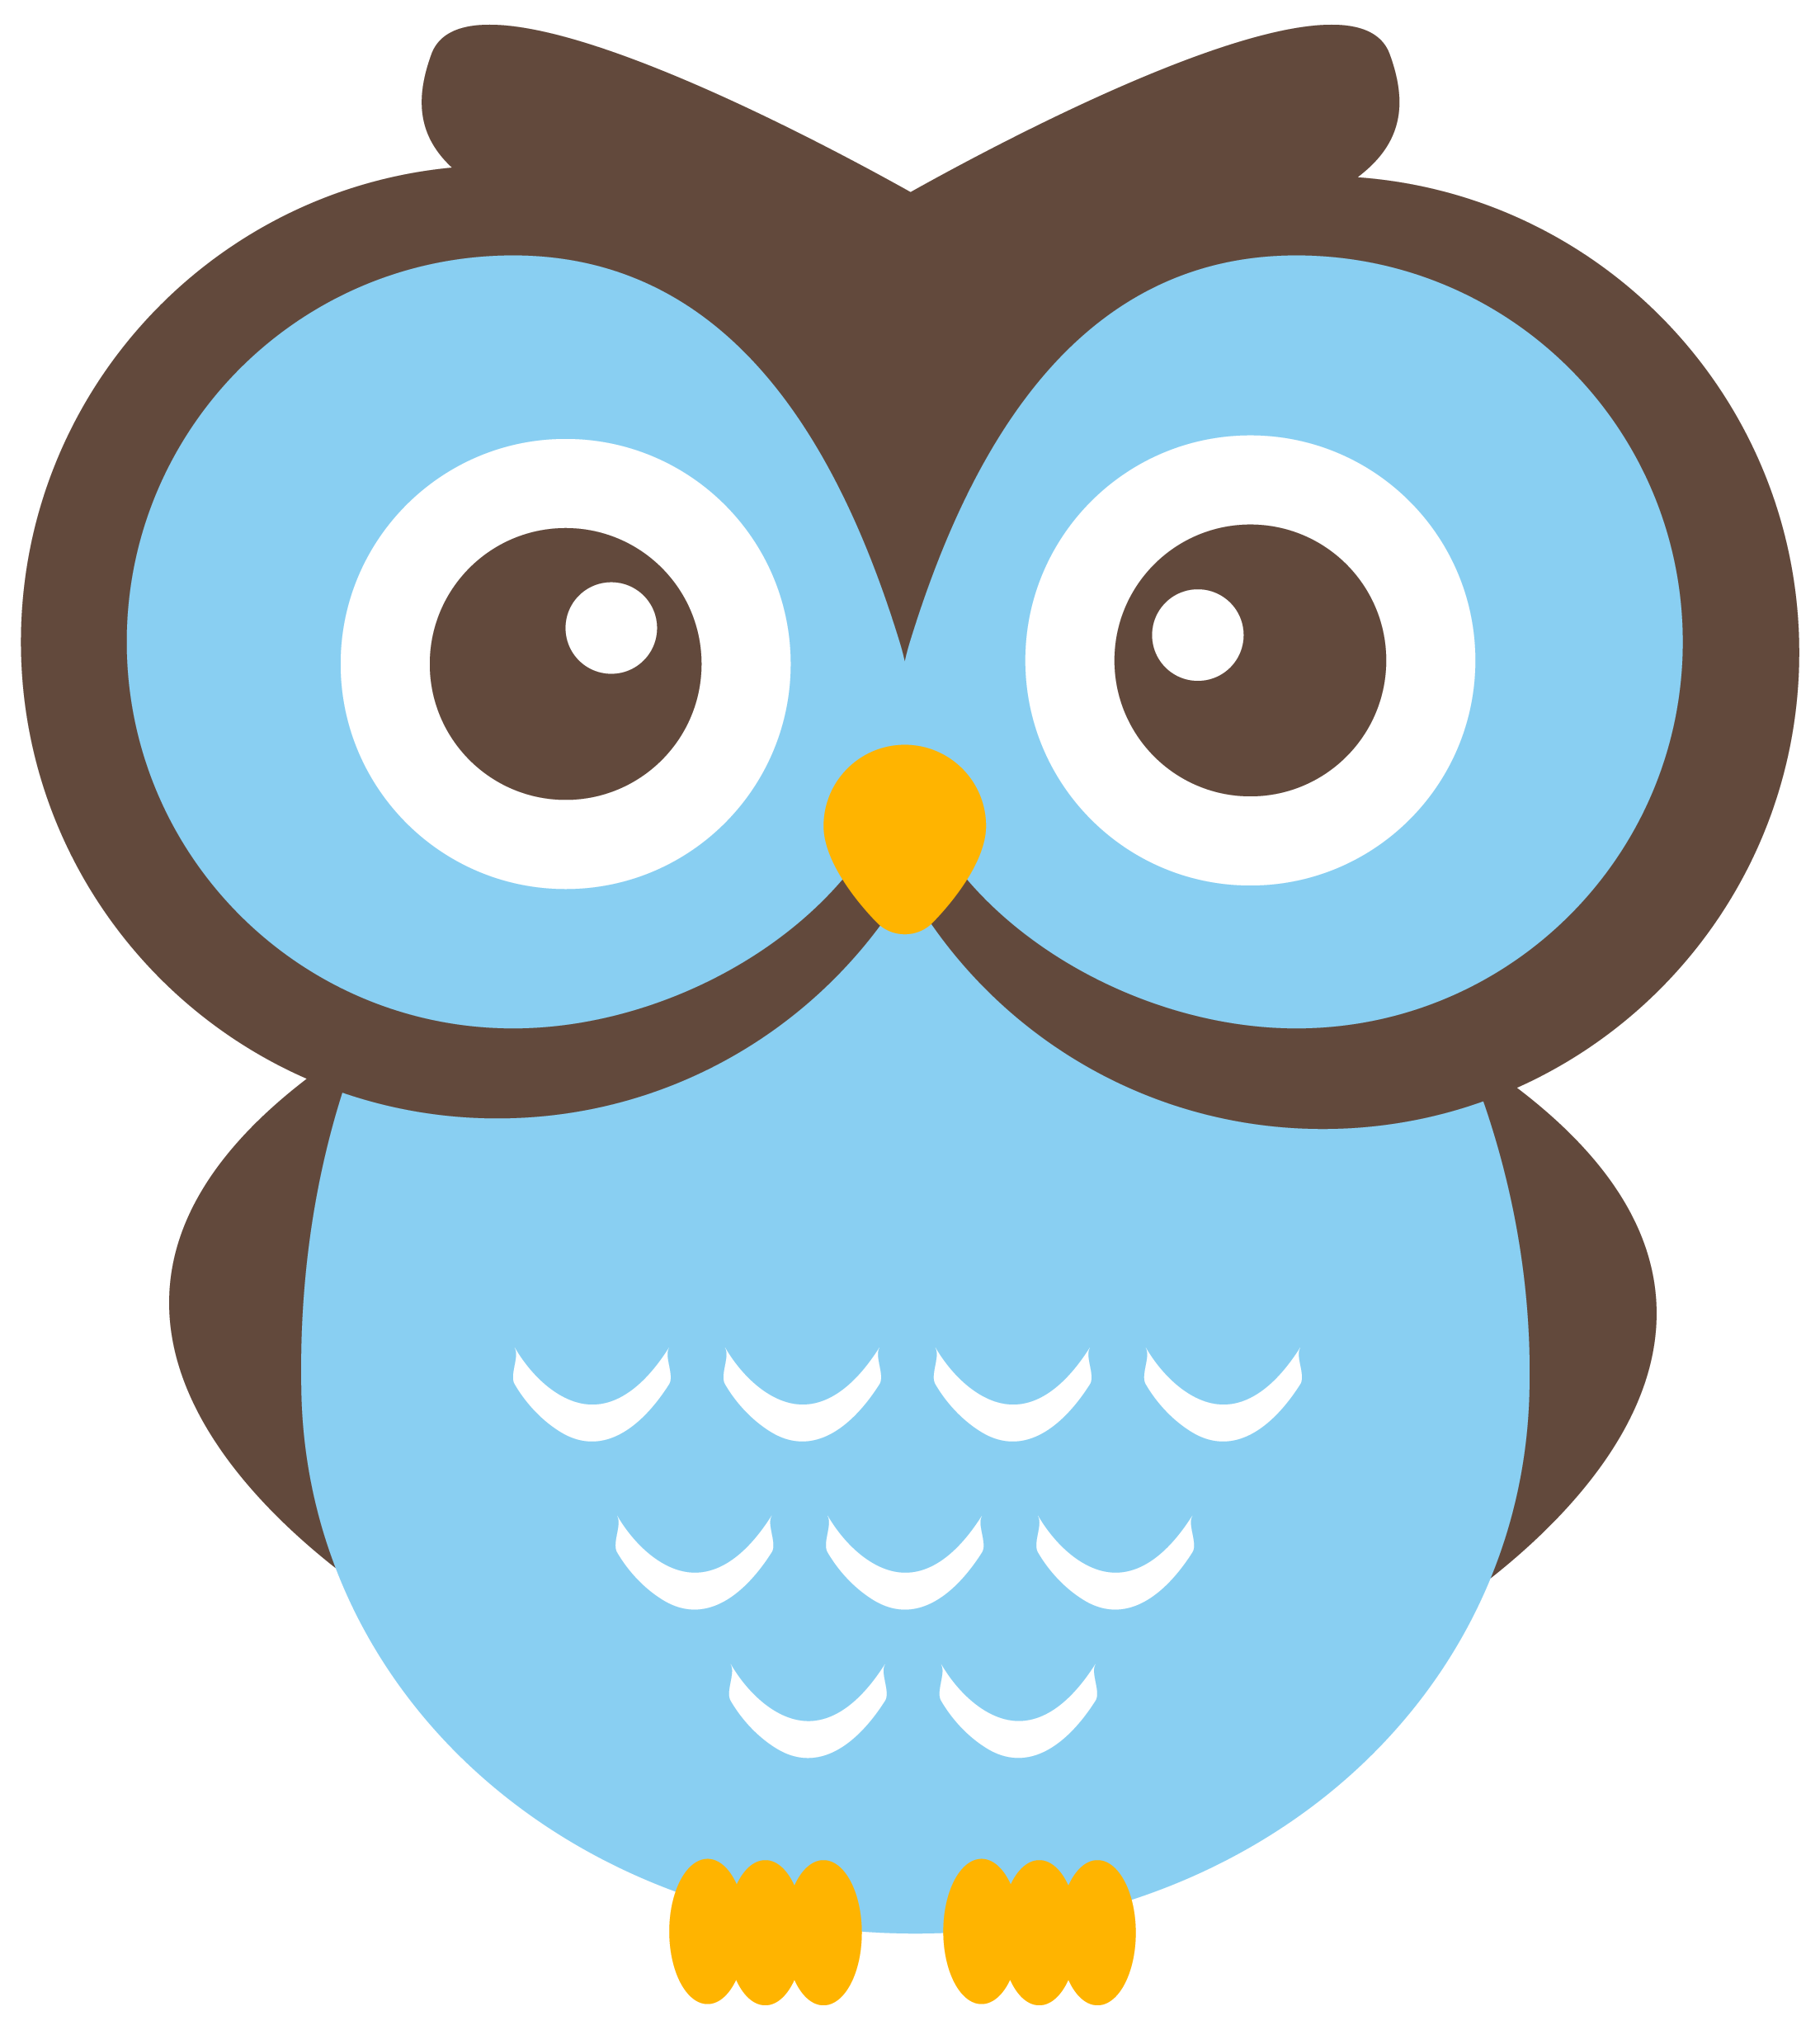 Free cartoon owl clipart image-Free cartoon owl clipart image-7